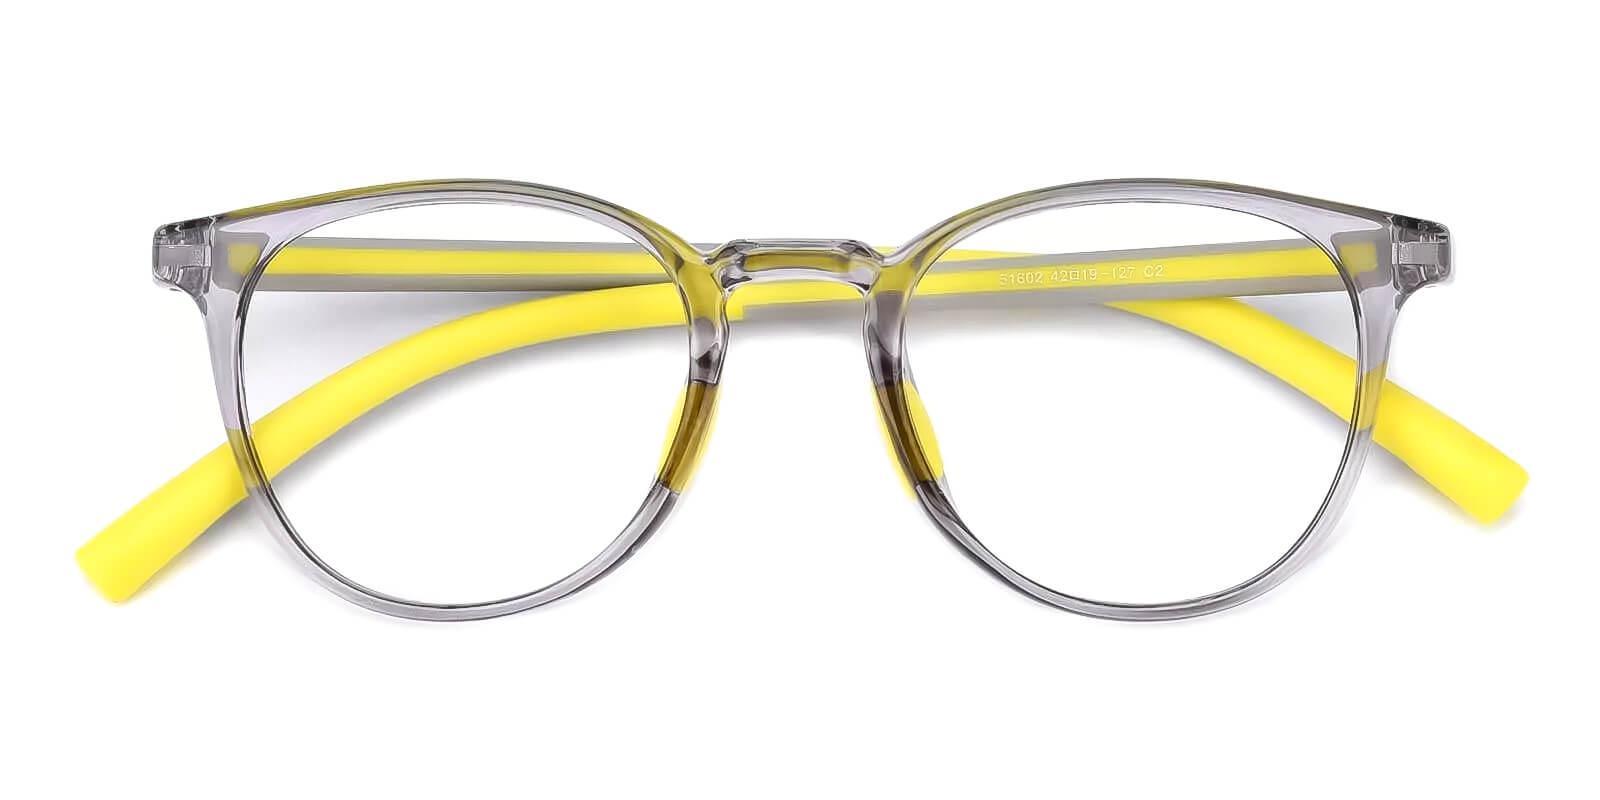 Kids-Experience Gray Plastic Eyeglasses , Fashion , UniversalBridgeFit Frames from ABBE Glasses